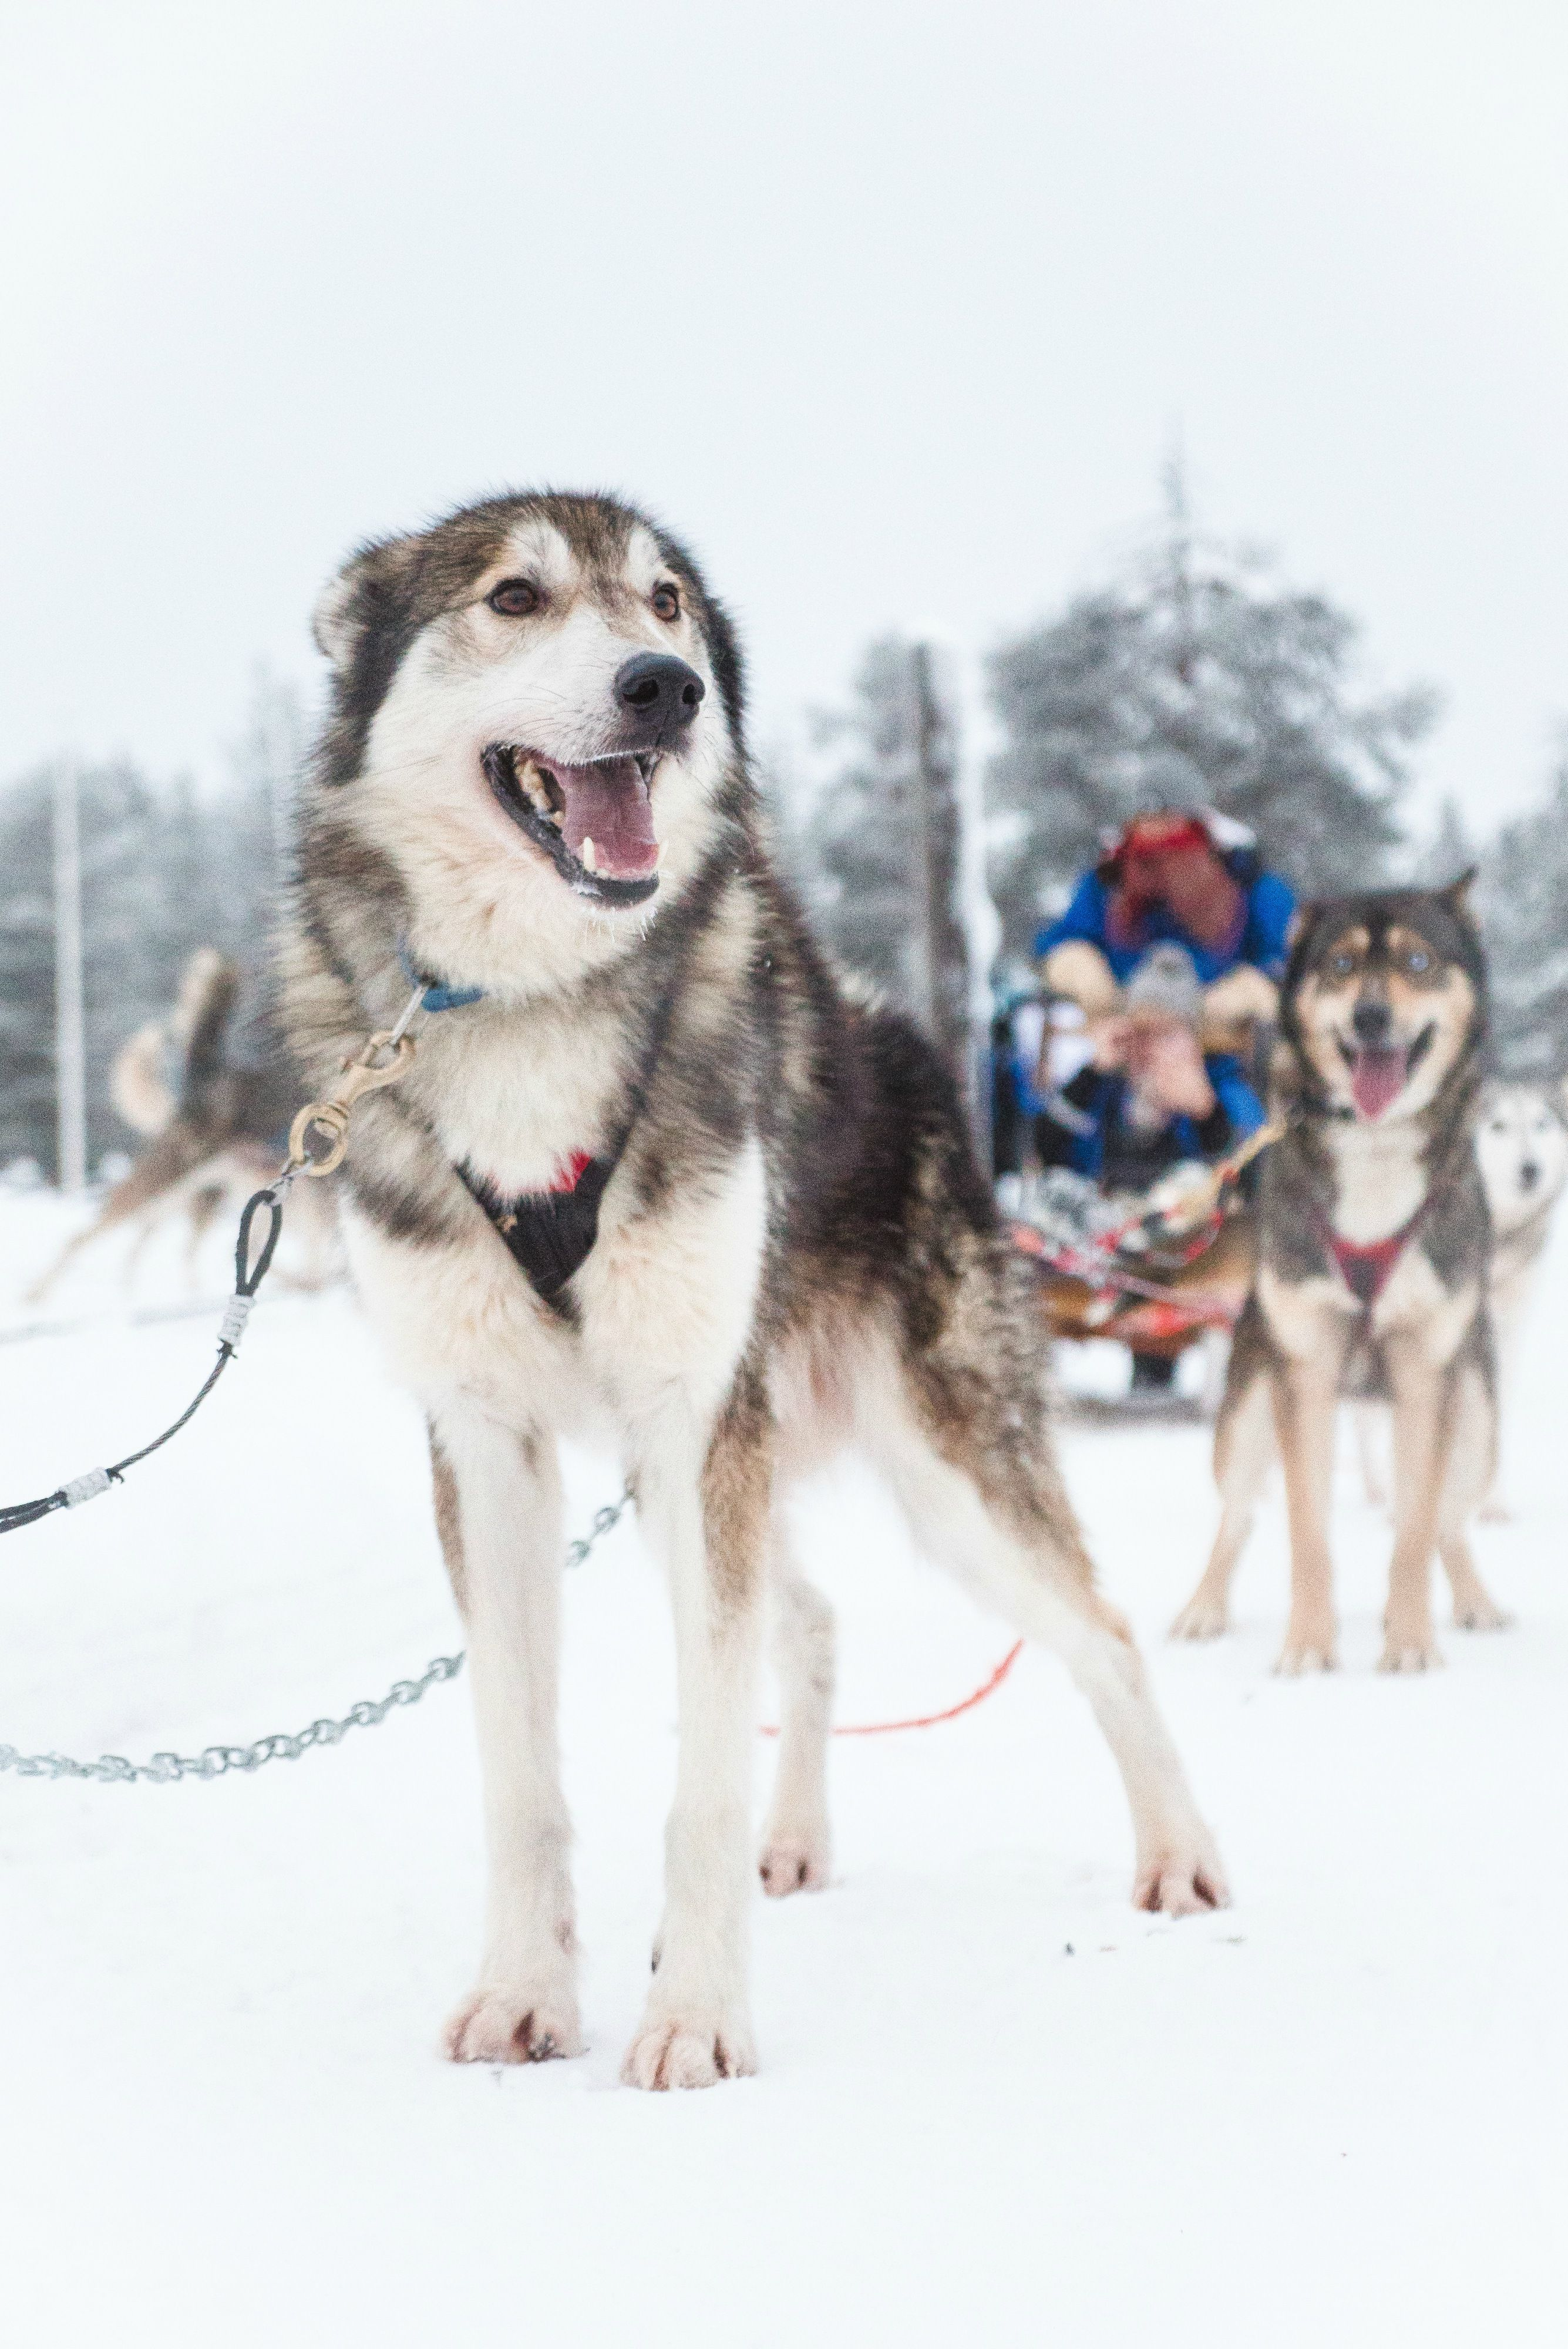 Husky Sledding In Salla Finland Smiling Dog Dog Photography